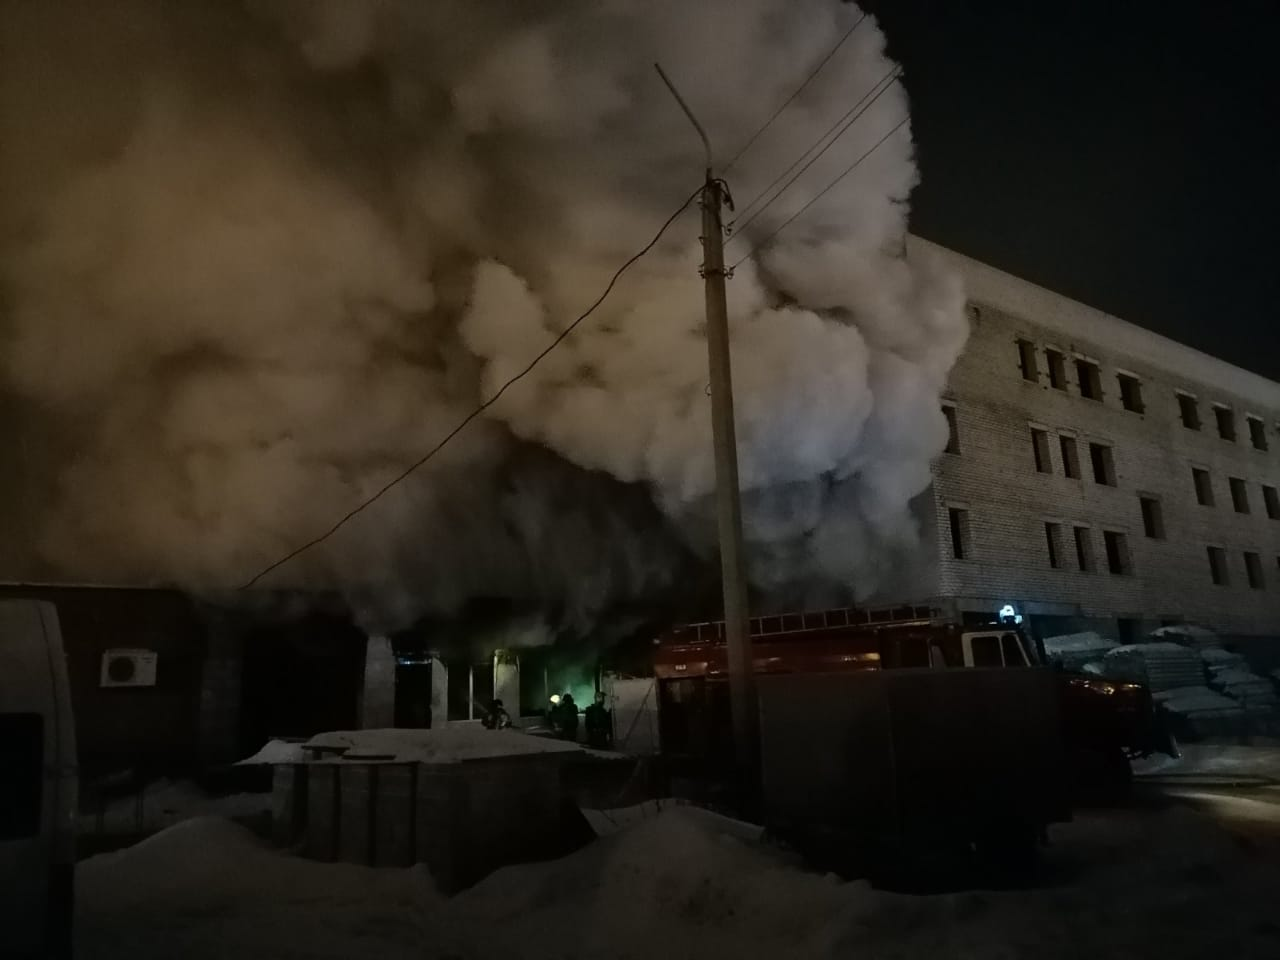 Из-за дыма почти не было видно соседних зданий